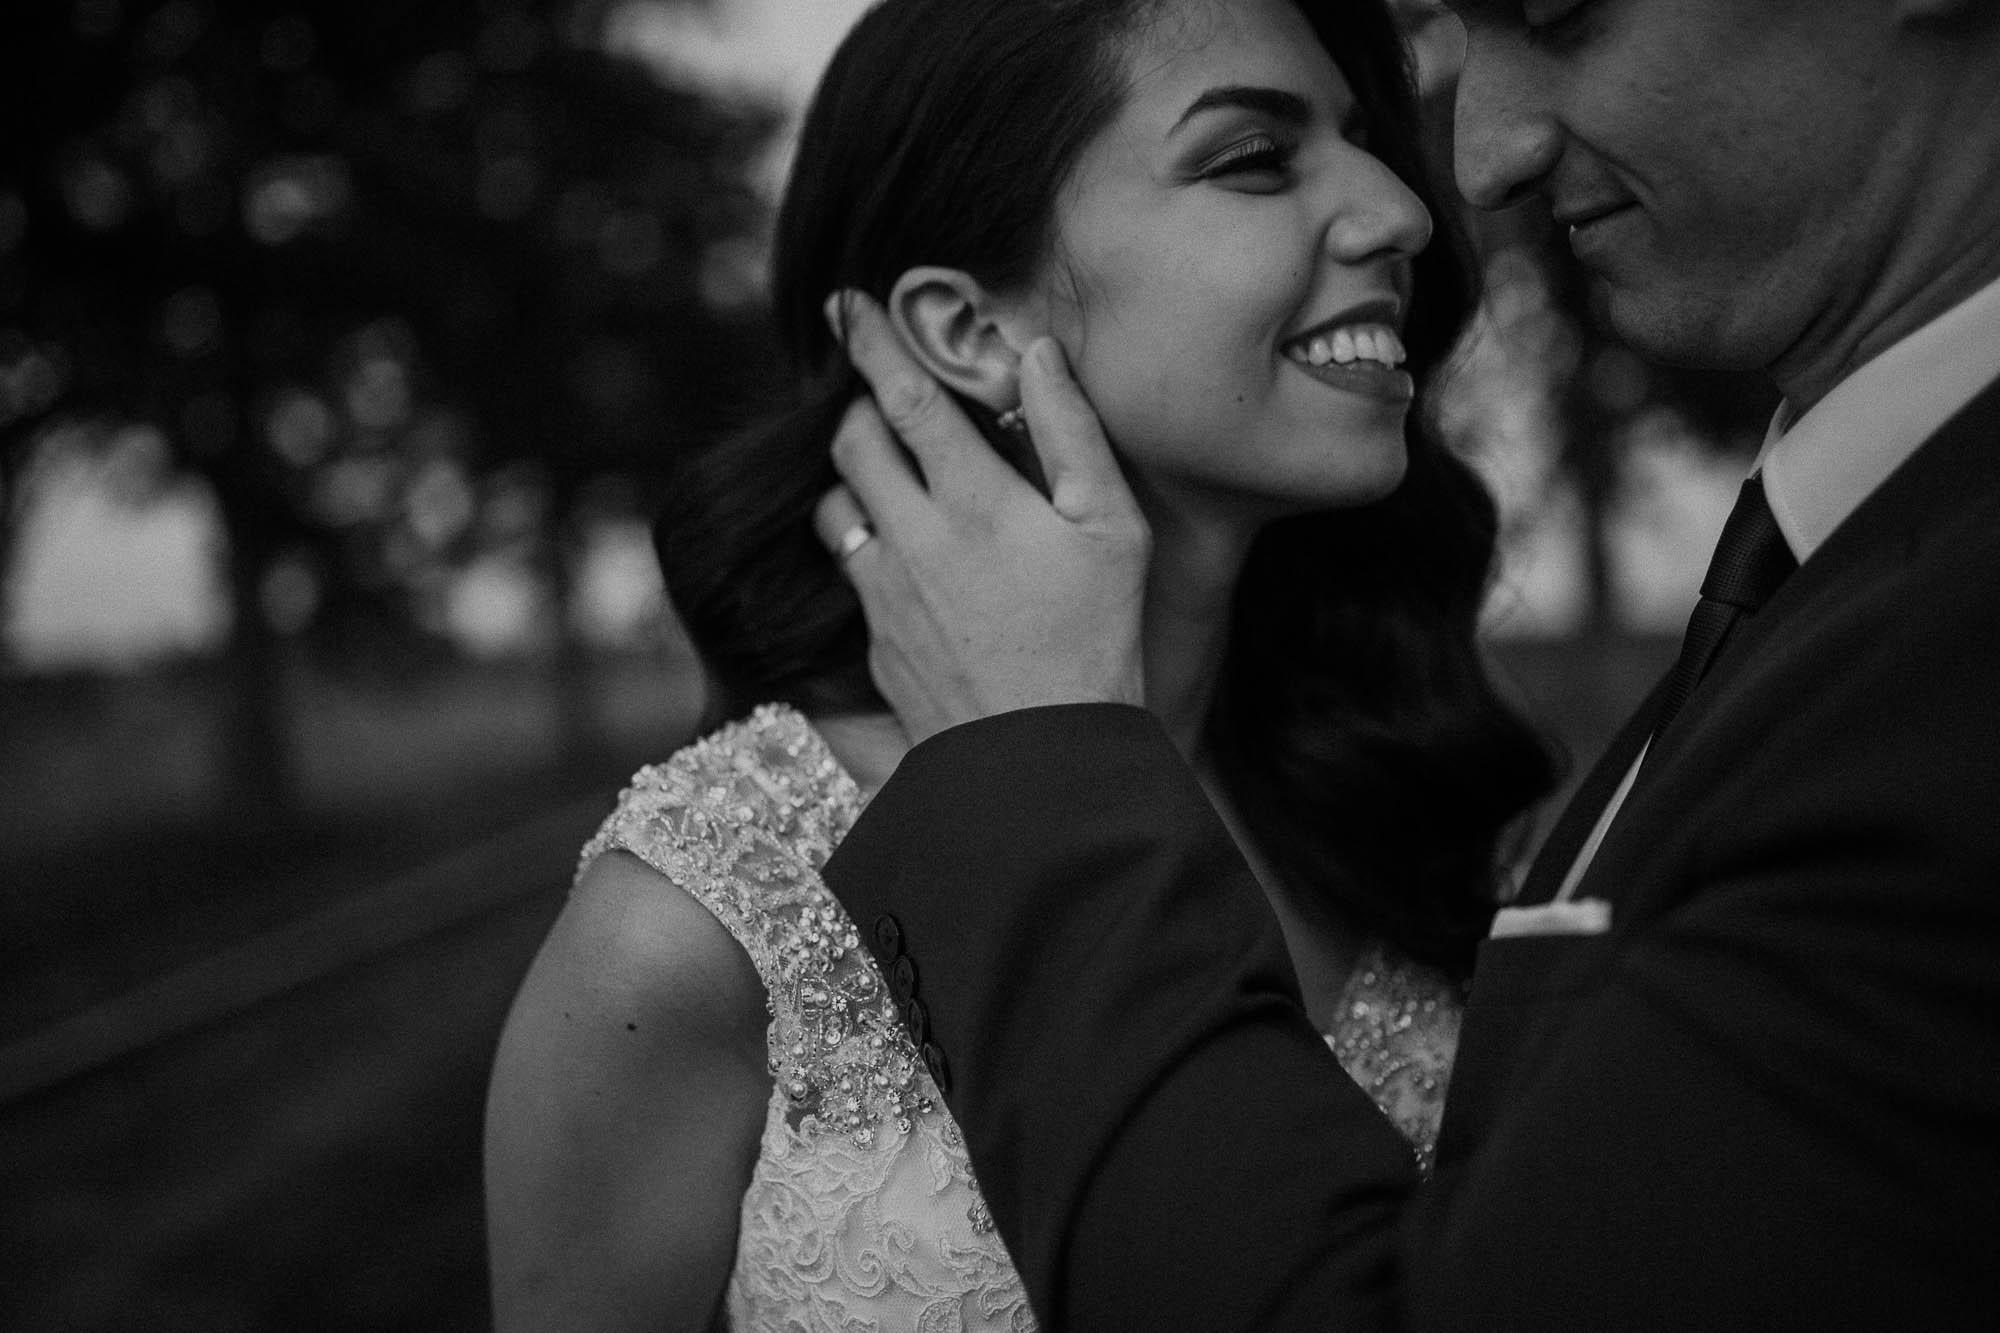 champaign_il_wedding_photography-0772.jpg